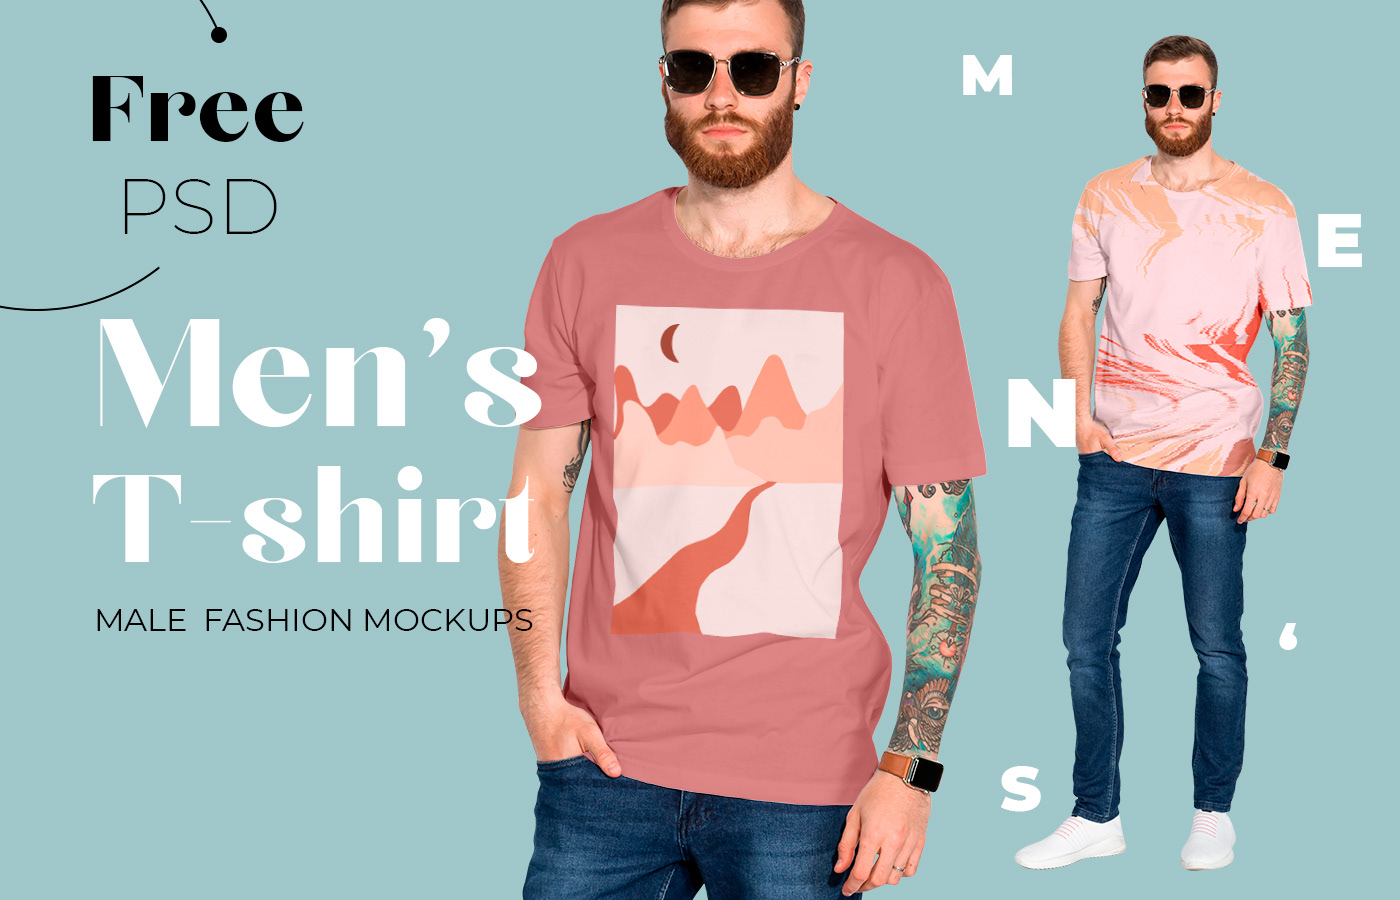 apparel mockup fashion mockup free free download free mockup  freebie graphic tees men's t-shirt mockup mockup download pattern design  t-shirt mockup